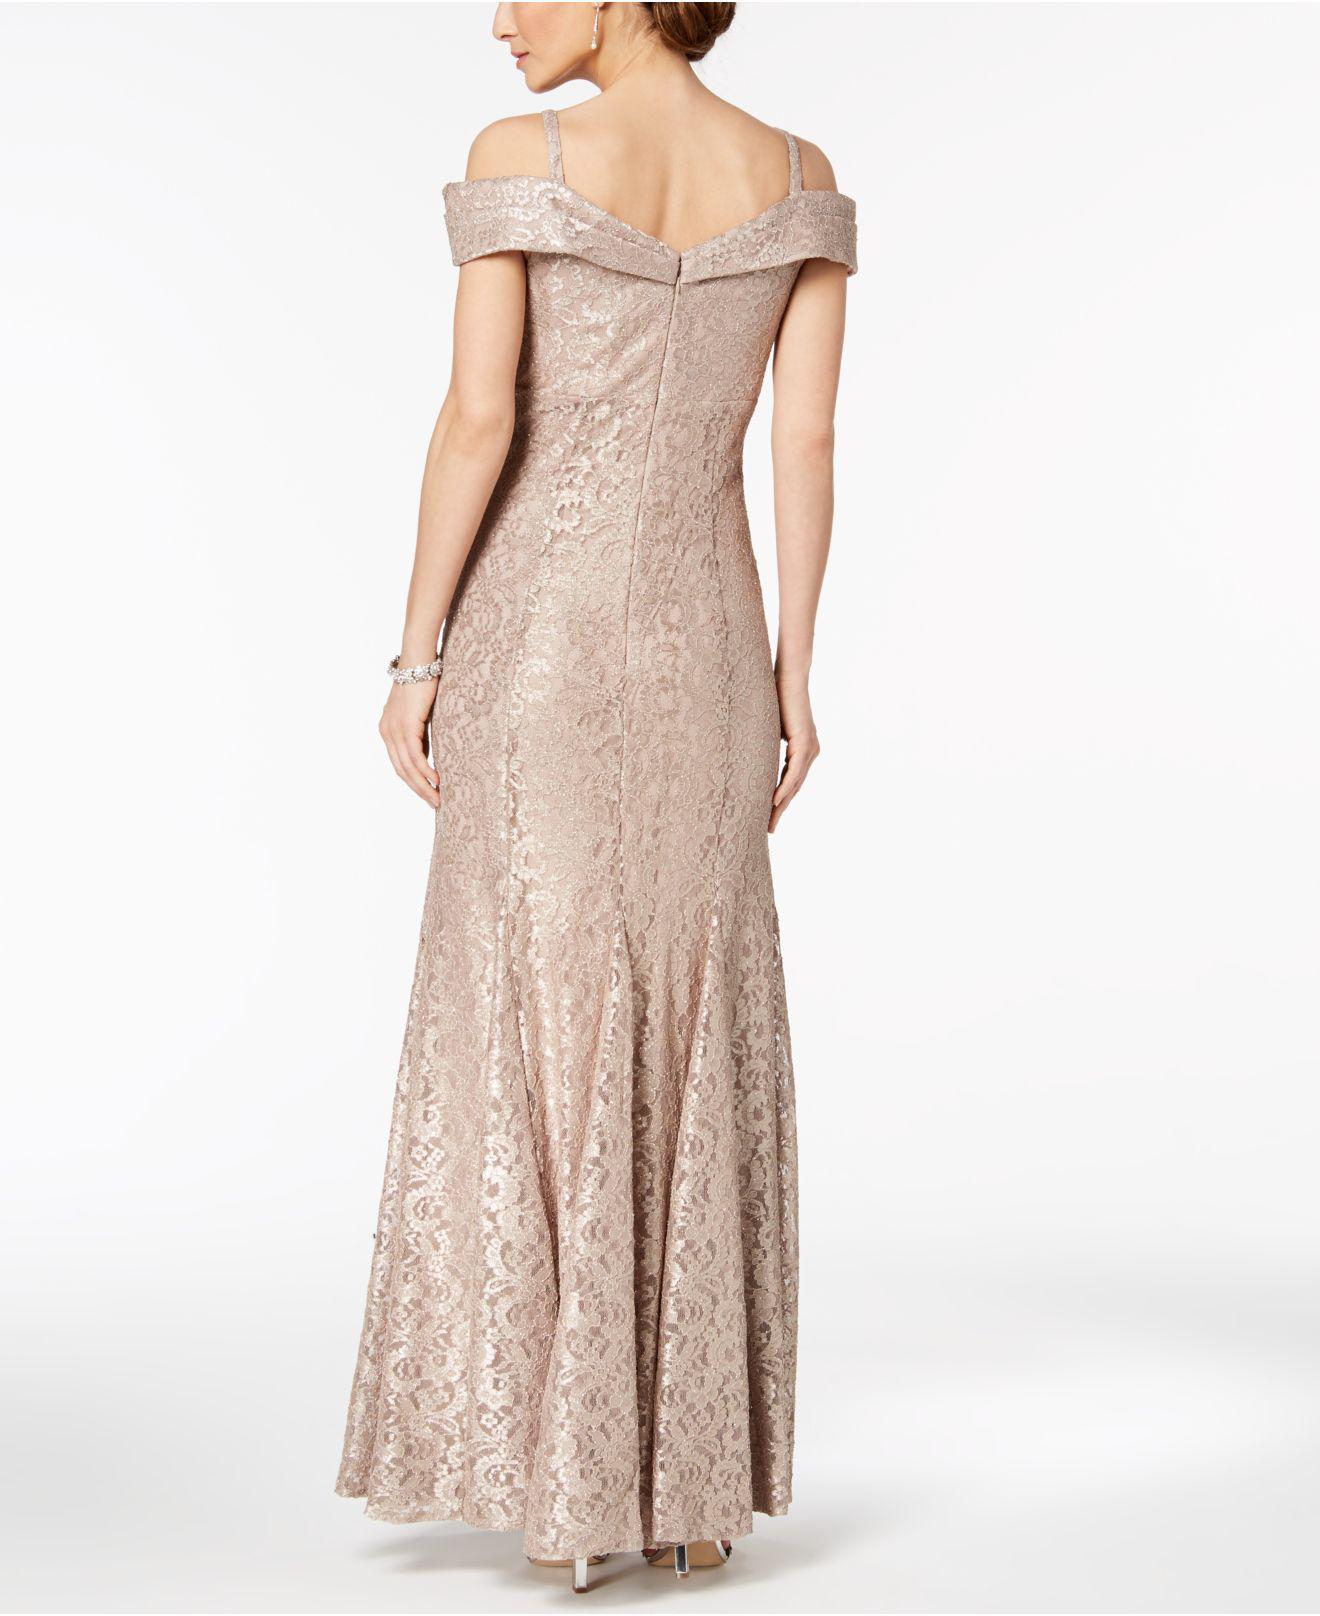 Lyst - R & M Richards Off-the-shoulder Lace Gown, Regular & Petite Sizes